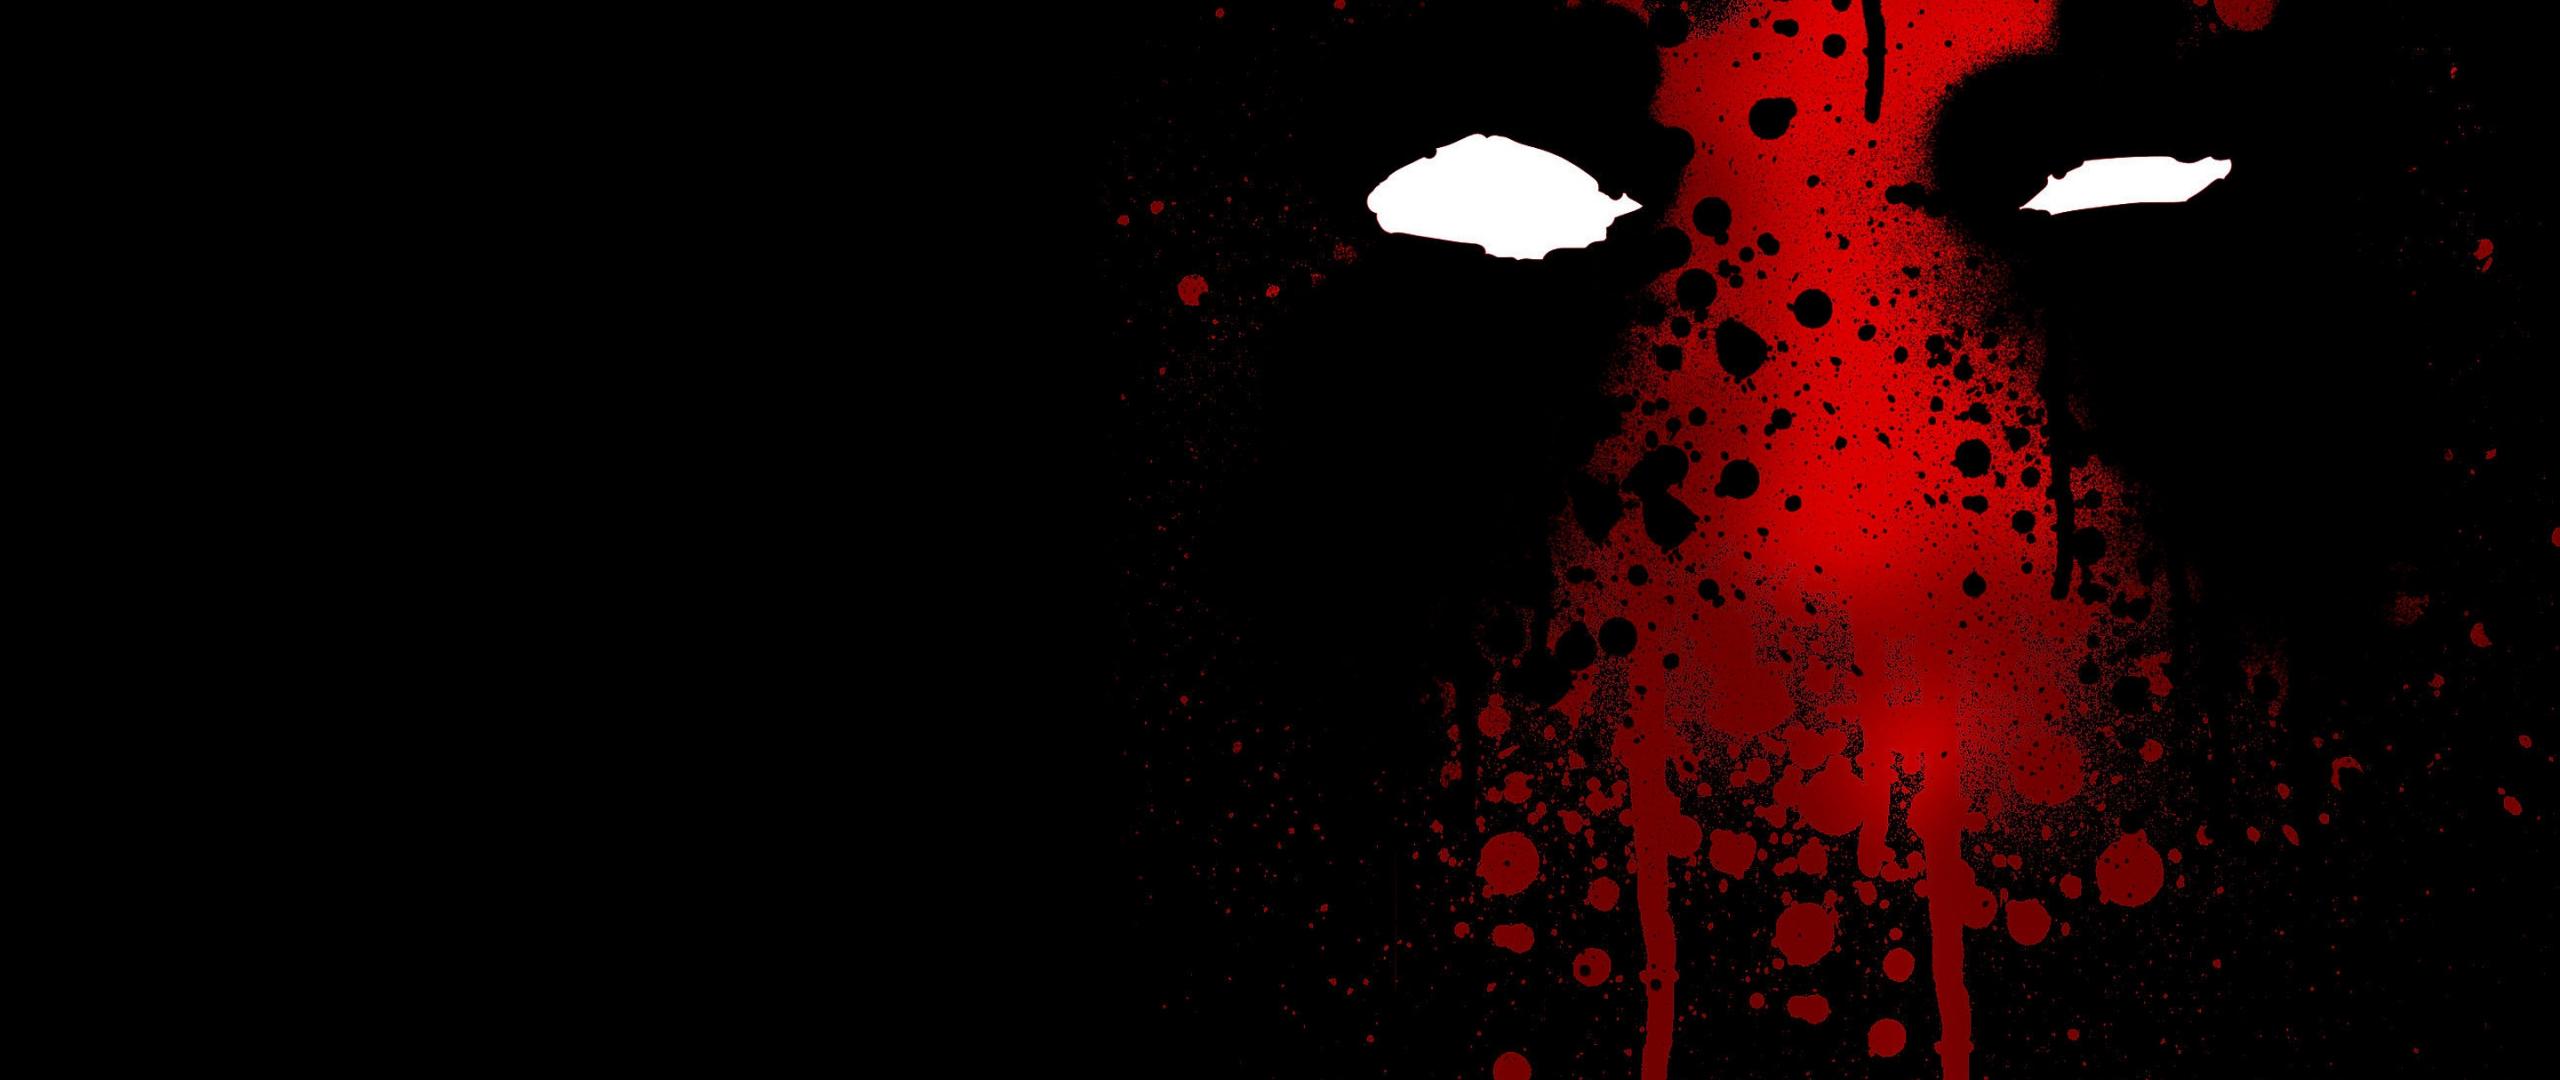 2560x1080 wallpaper Deadpool face, dark